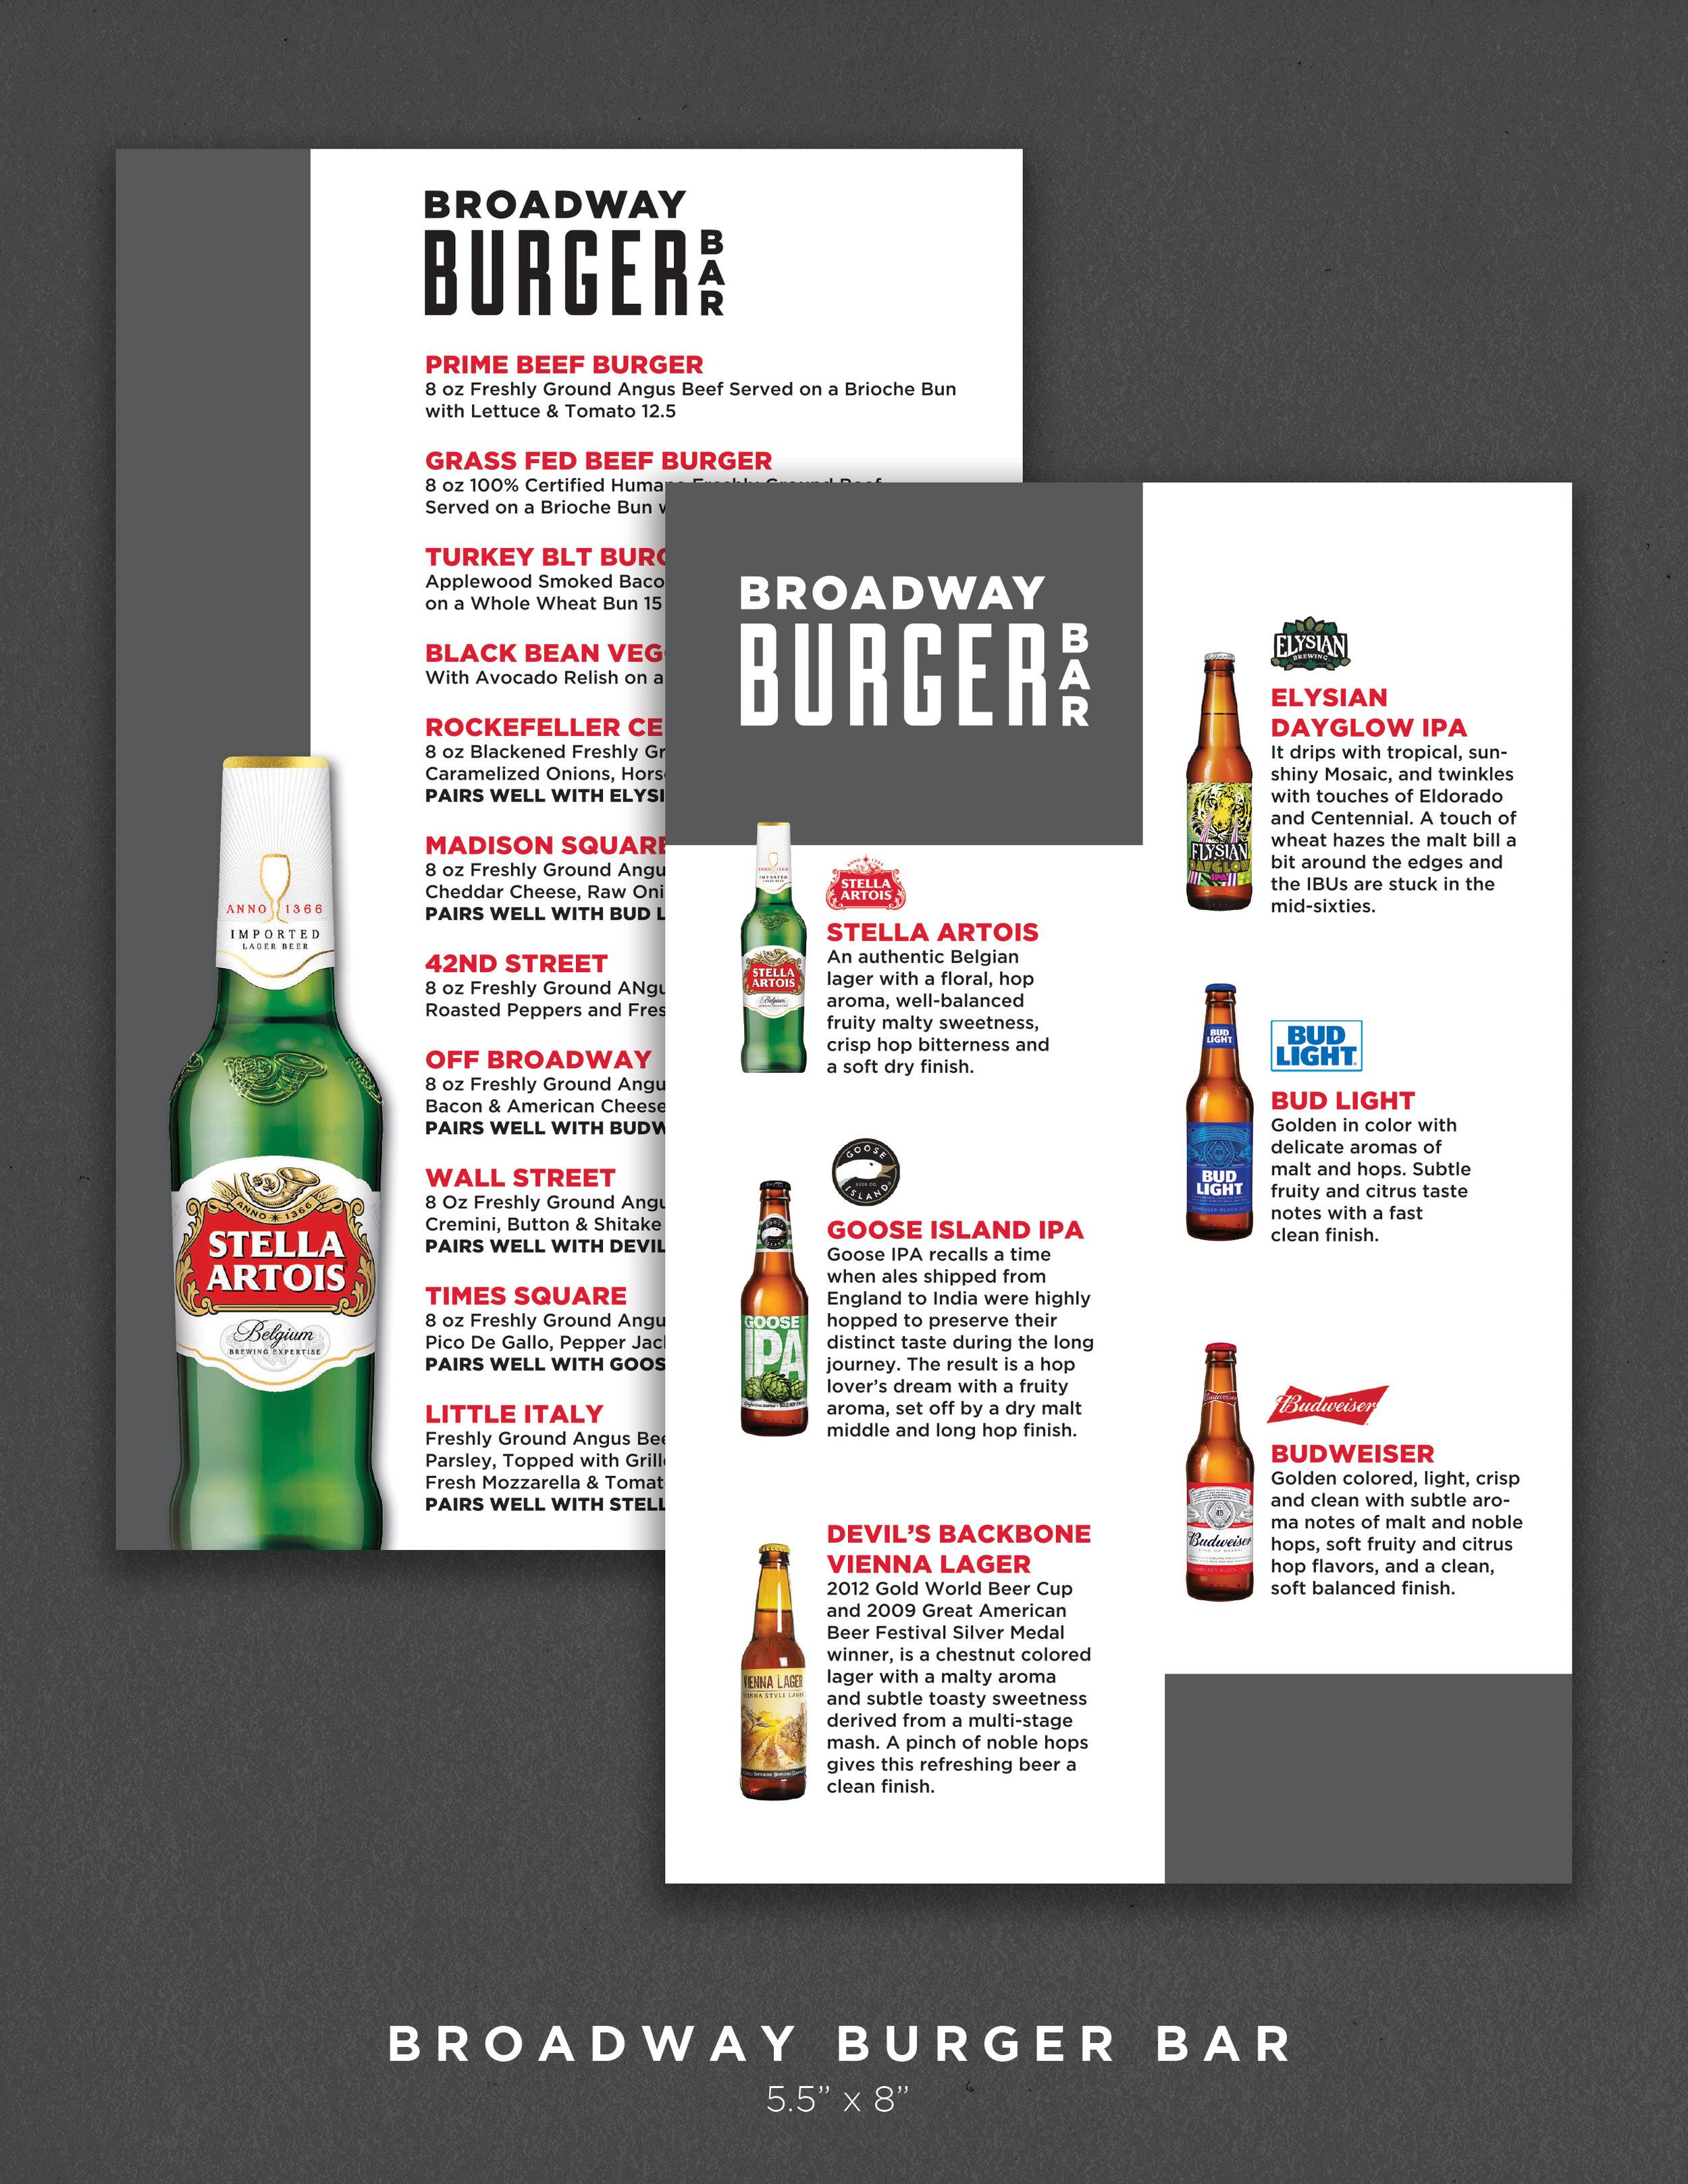 Broadway Burger Bar.jpg